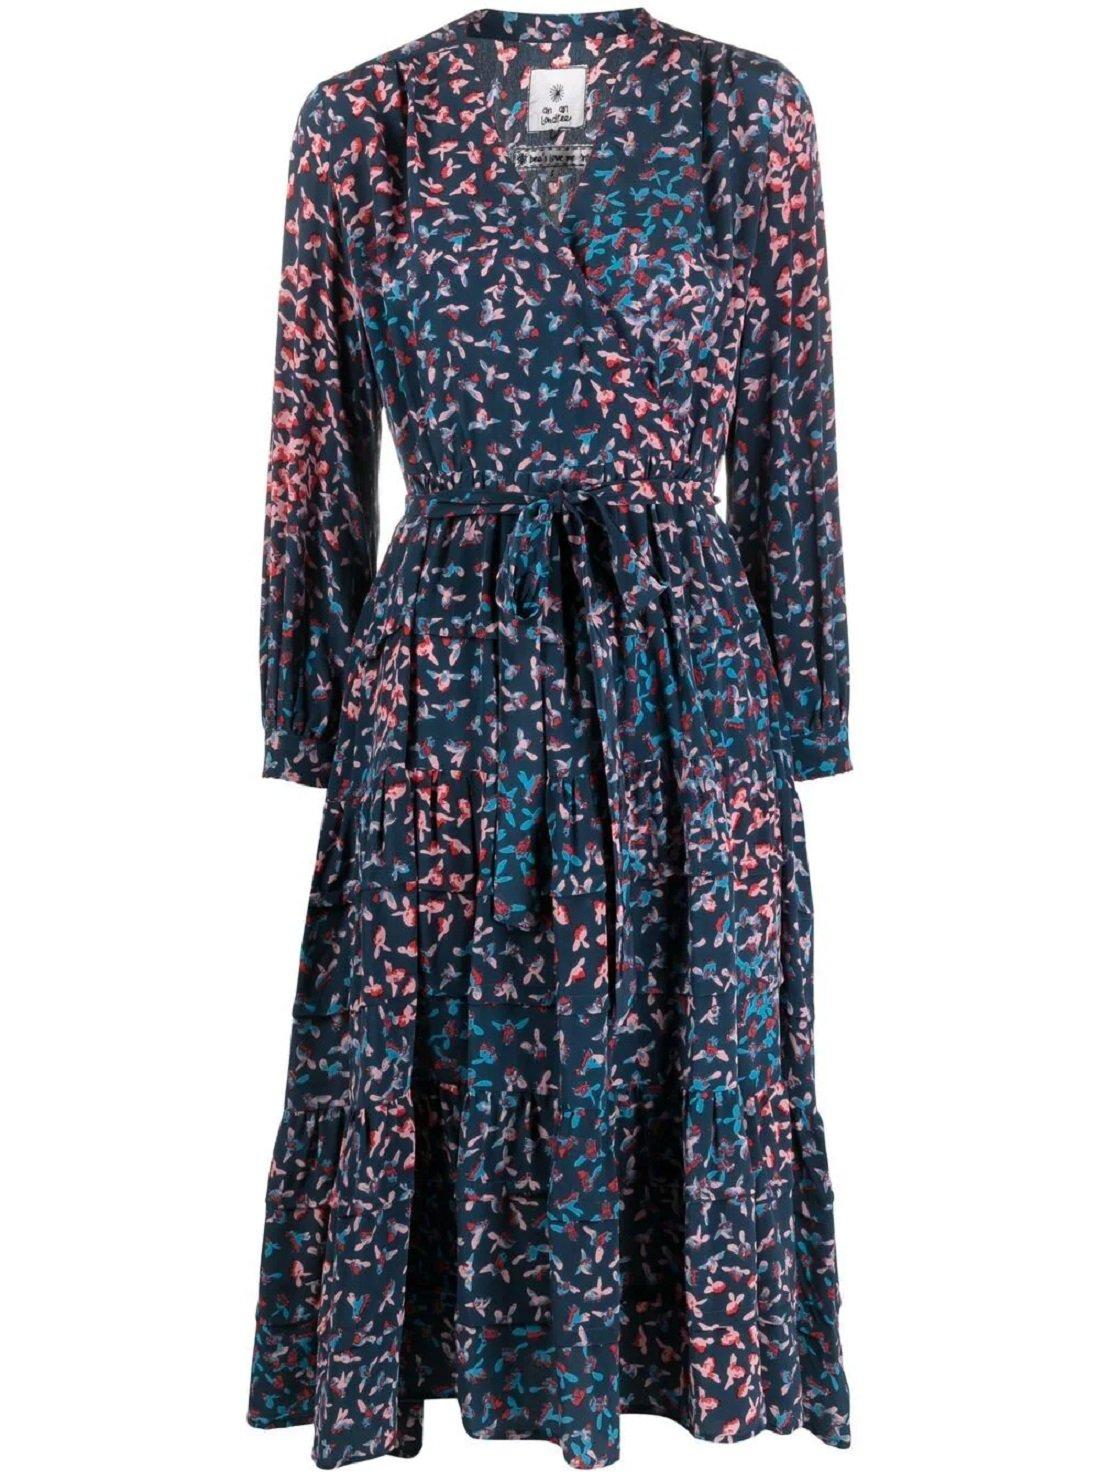 Volant silk dress